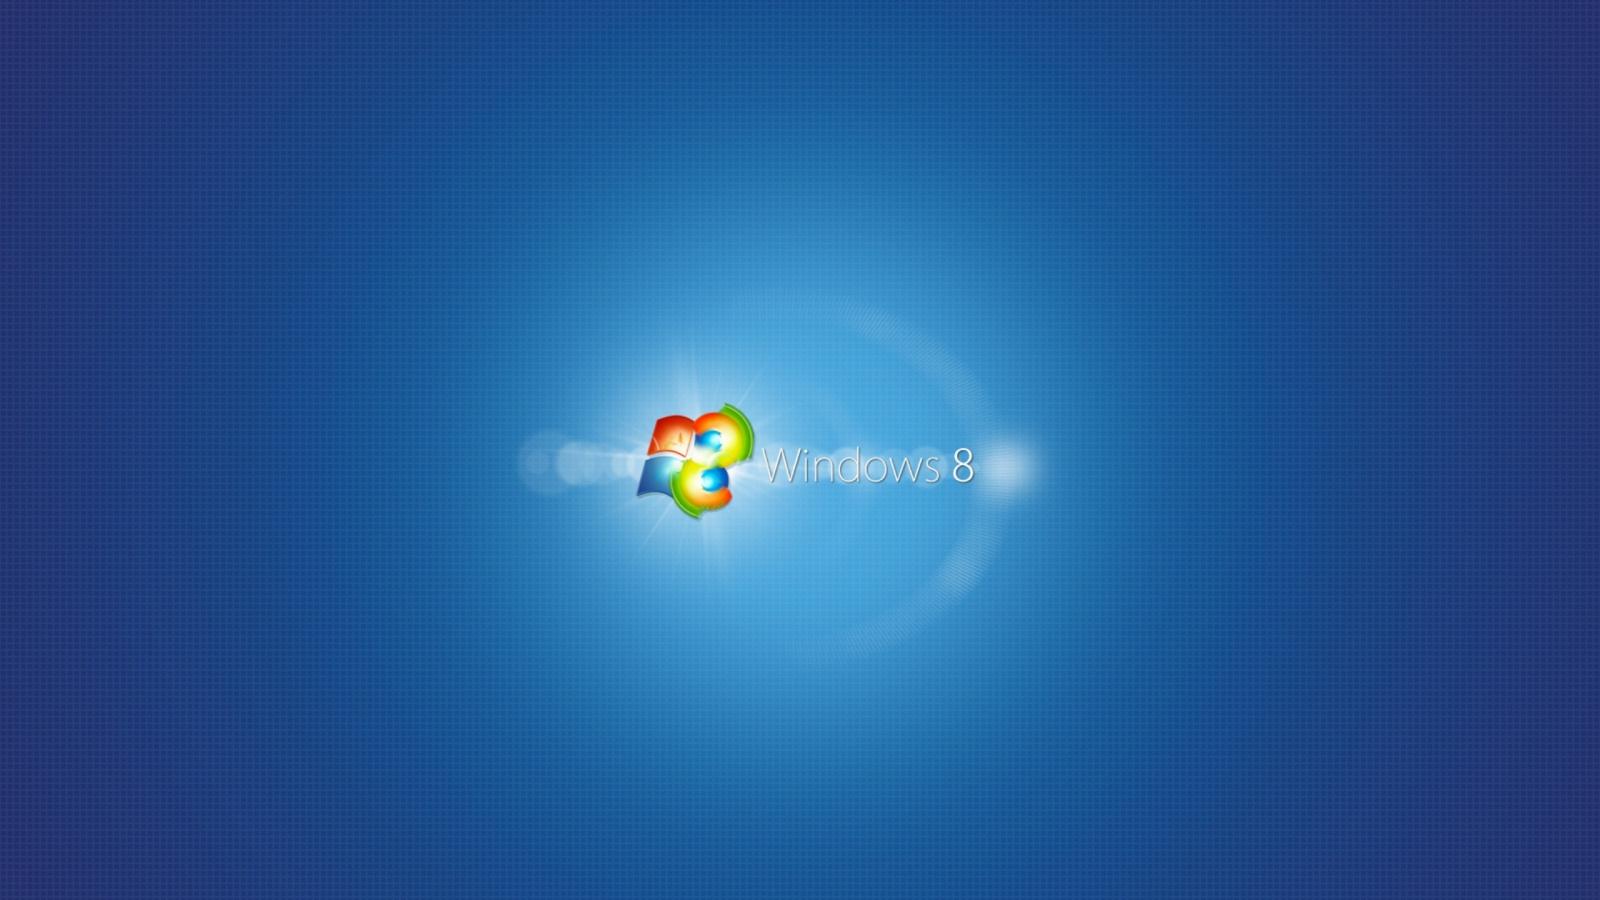 wallpaper desktop background in 1600x900 HD Widescreen resolution 1600x900